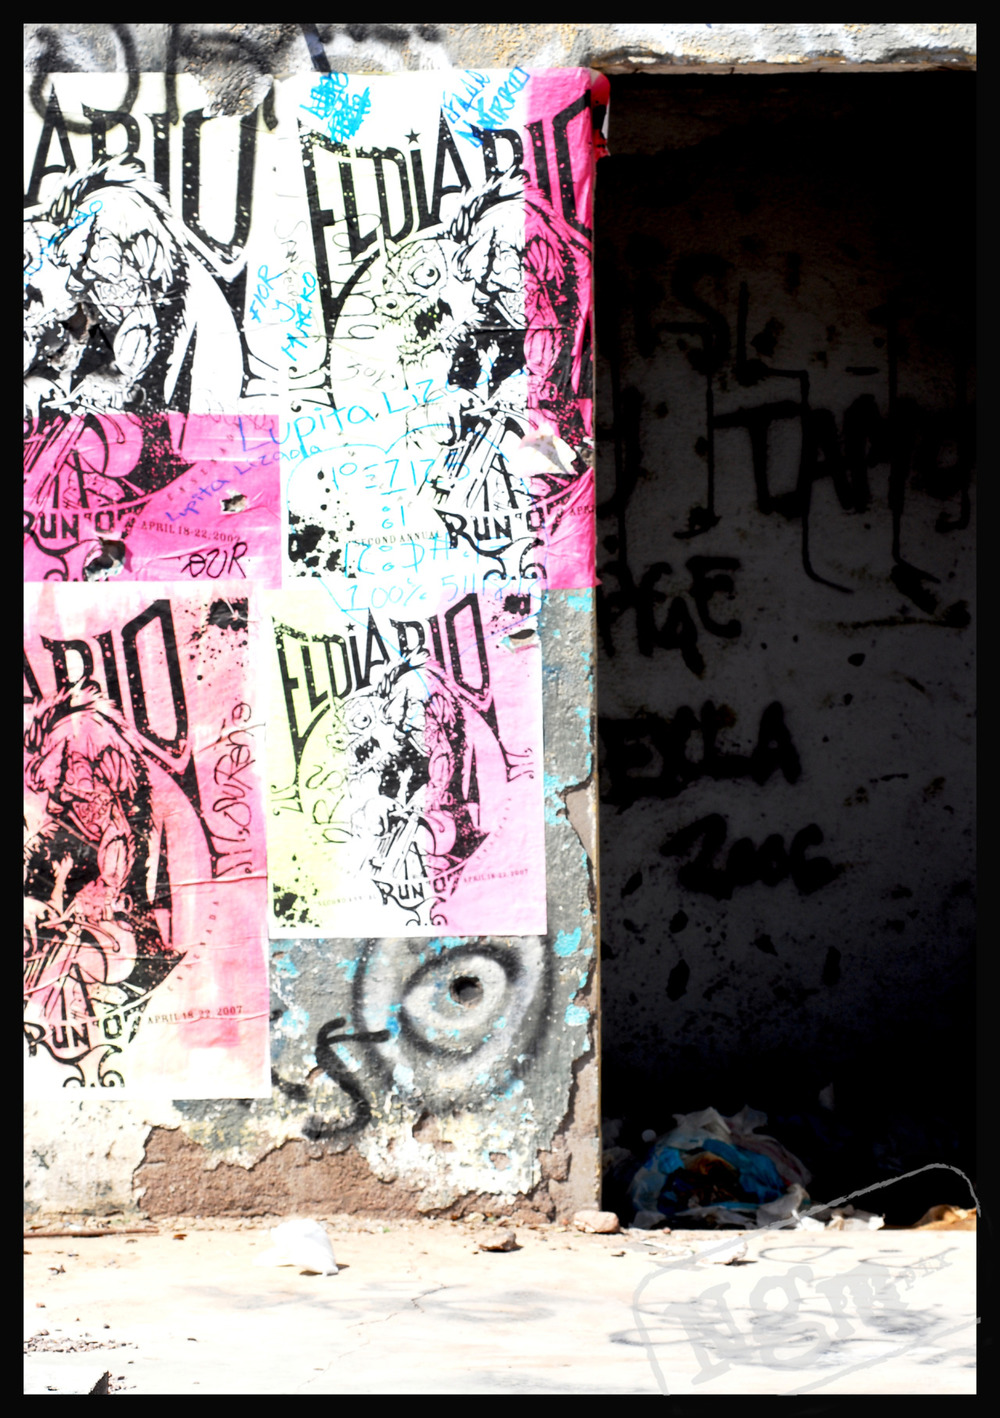 tumblr_mmwf6xffFk1s9zuedo3_1280.jpg